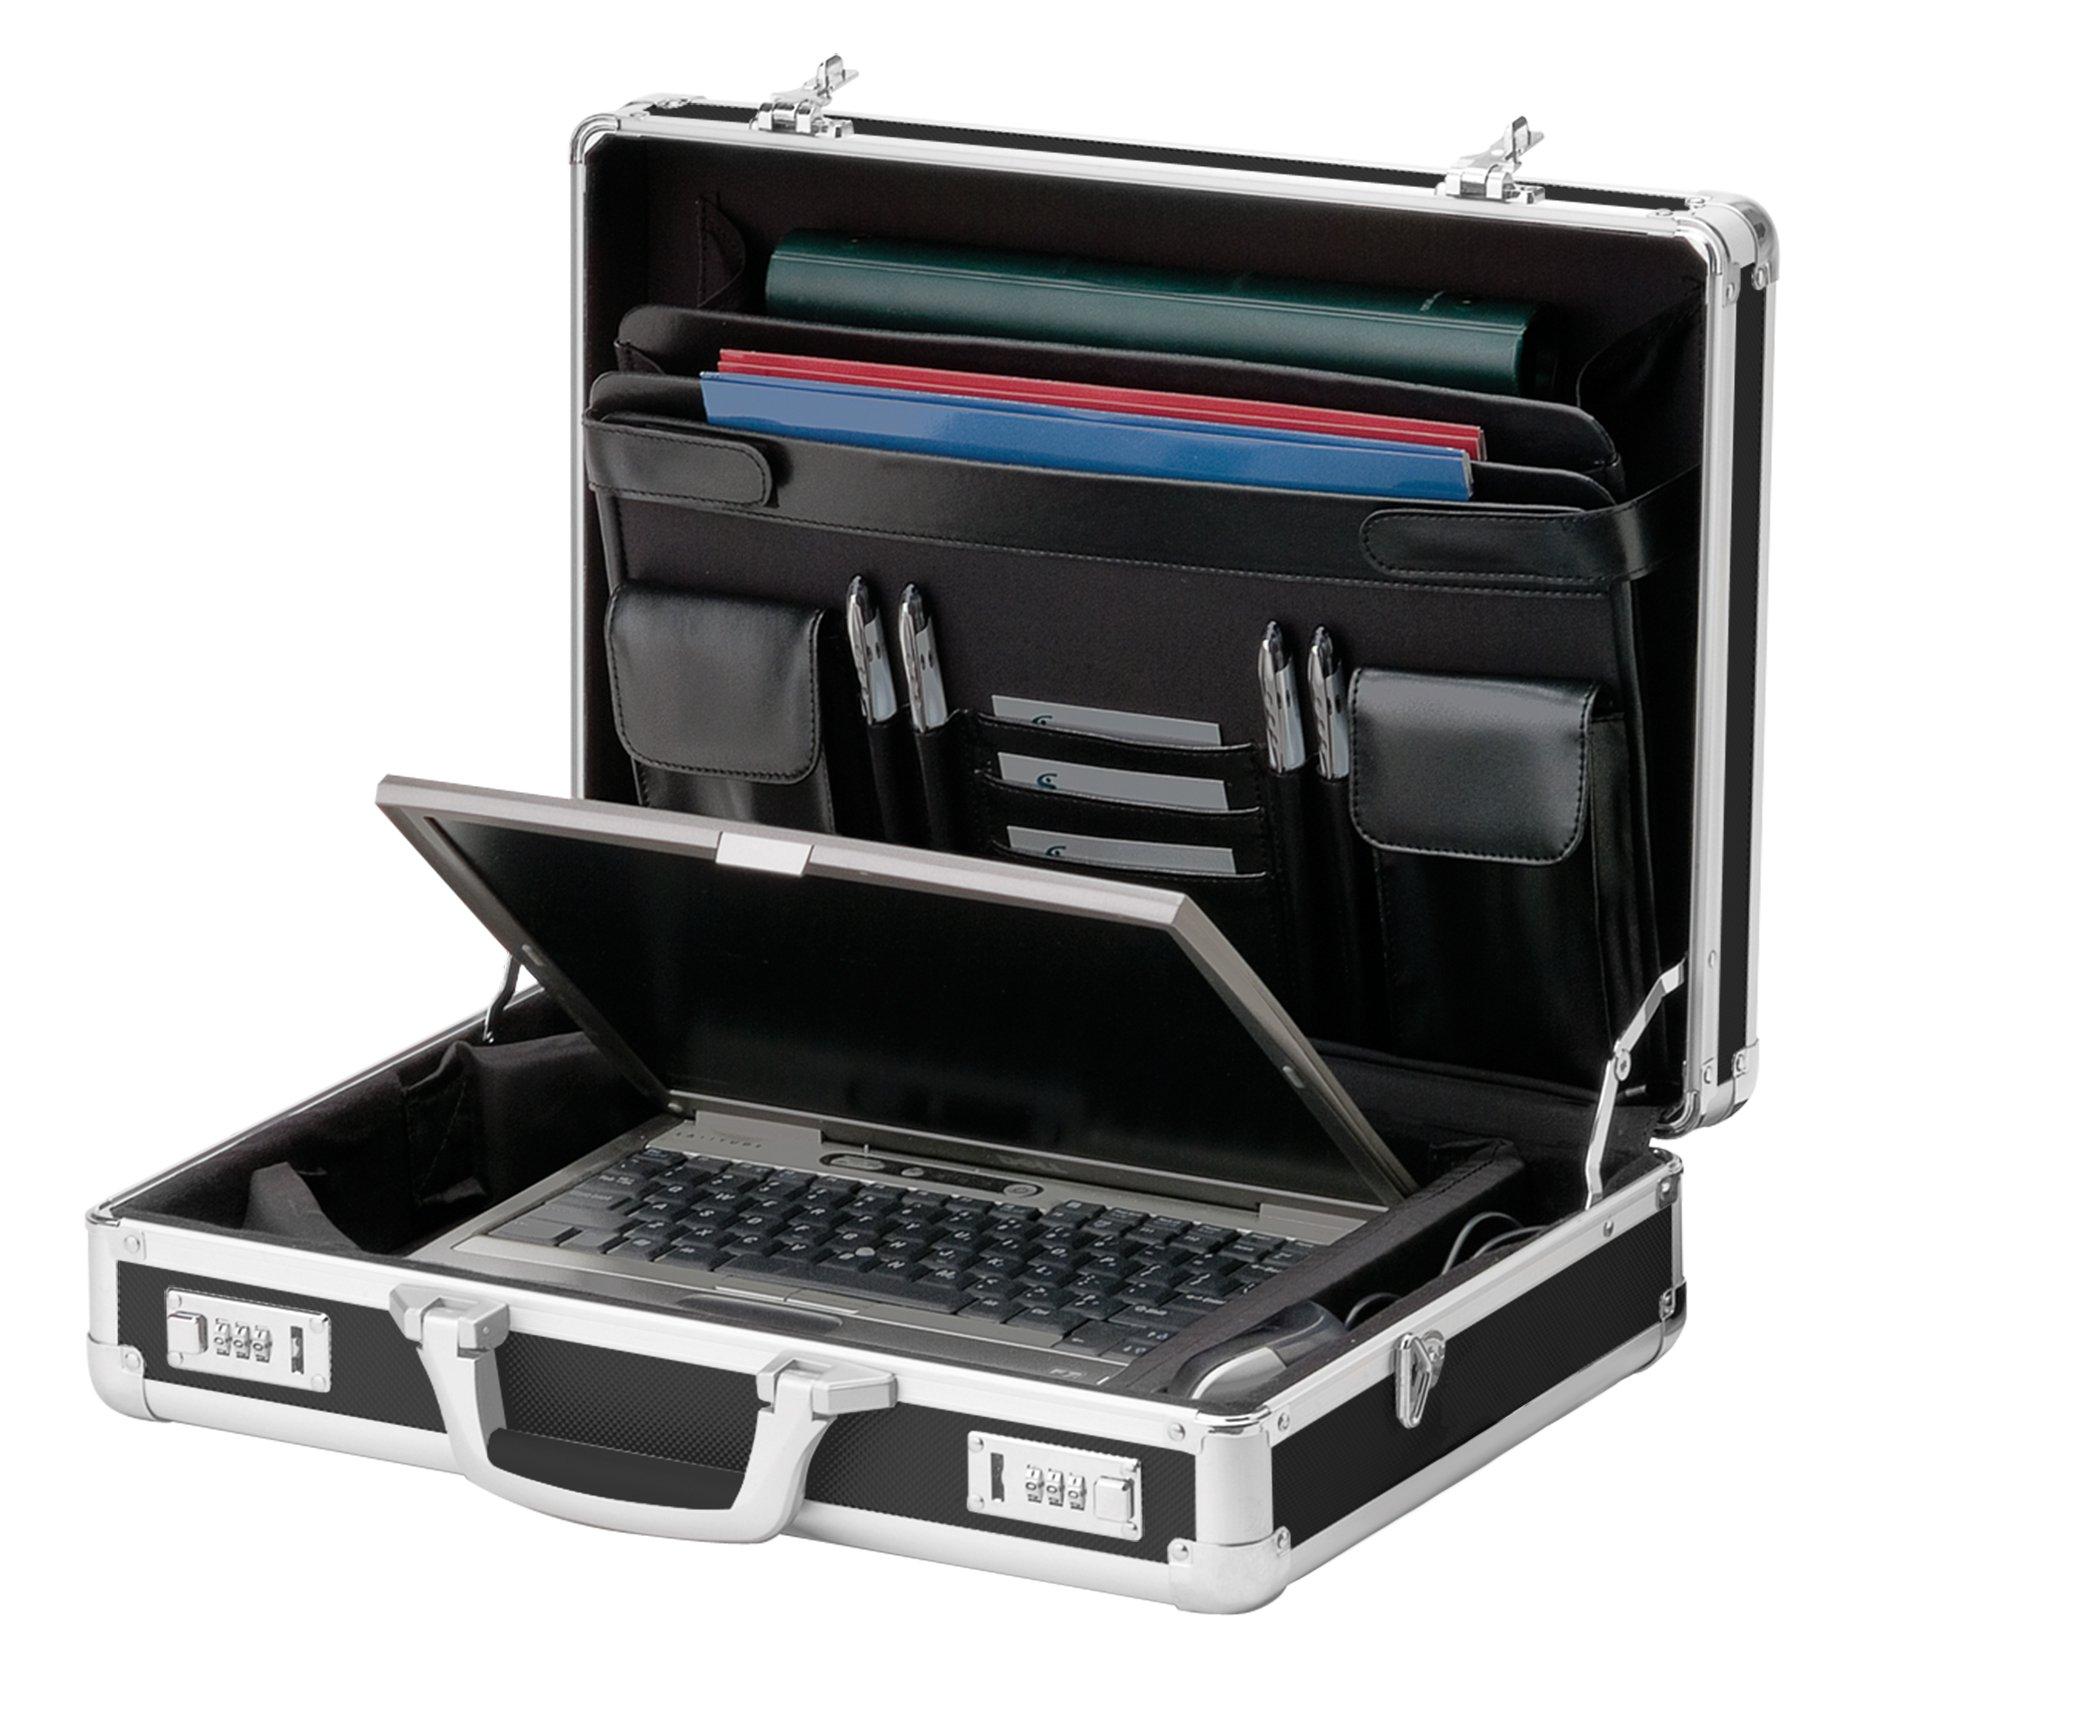 Vaultz Locking Laptop Case, Black (VZ01216) by Vaultz (Image #1)